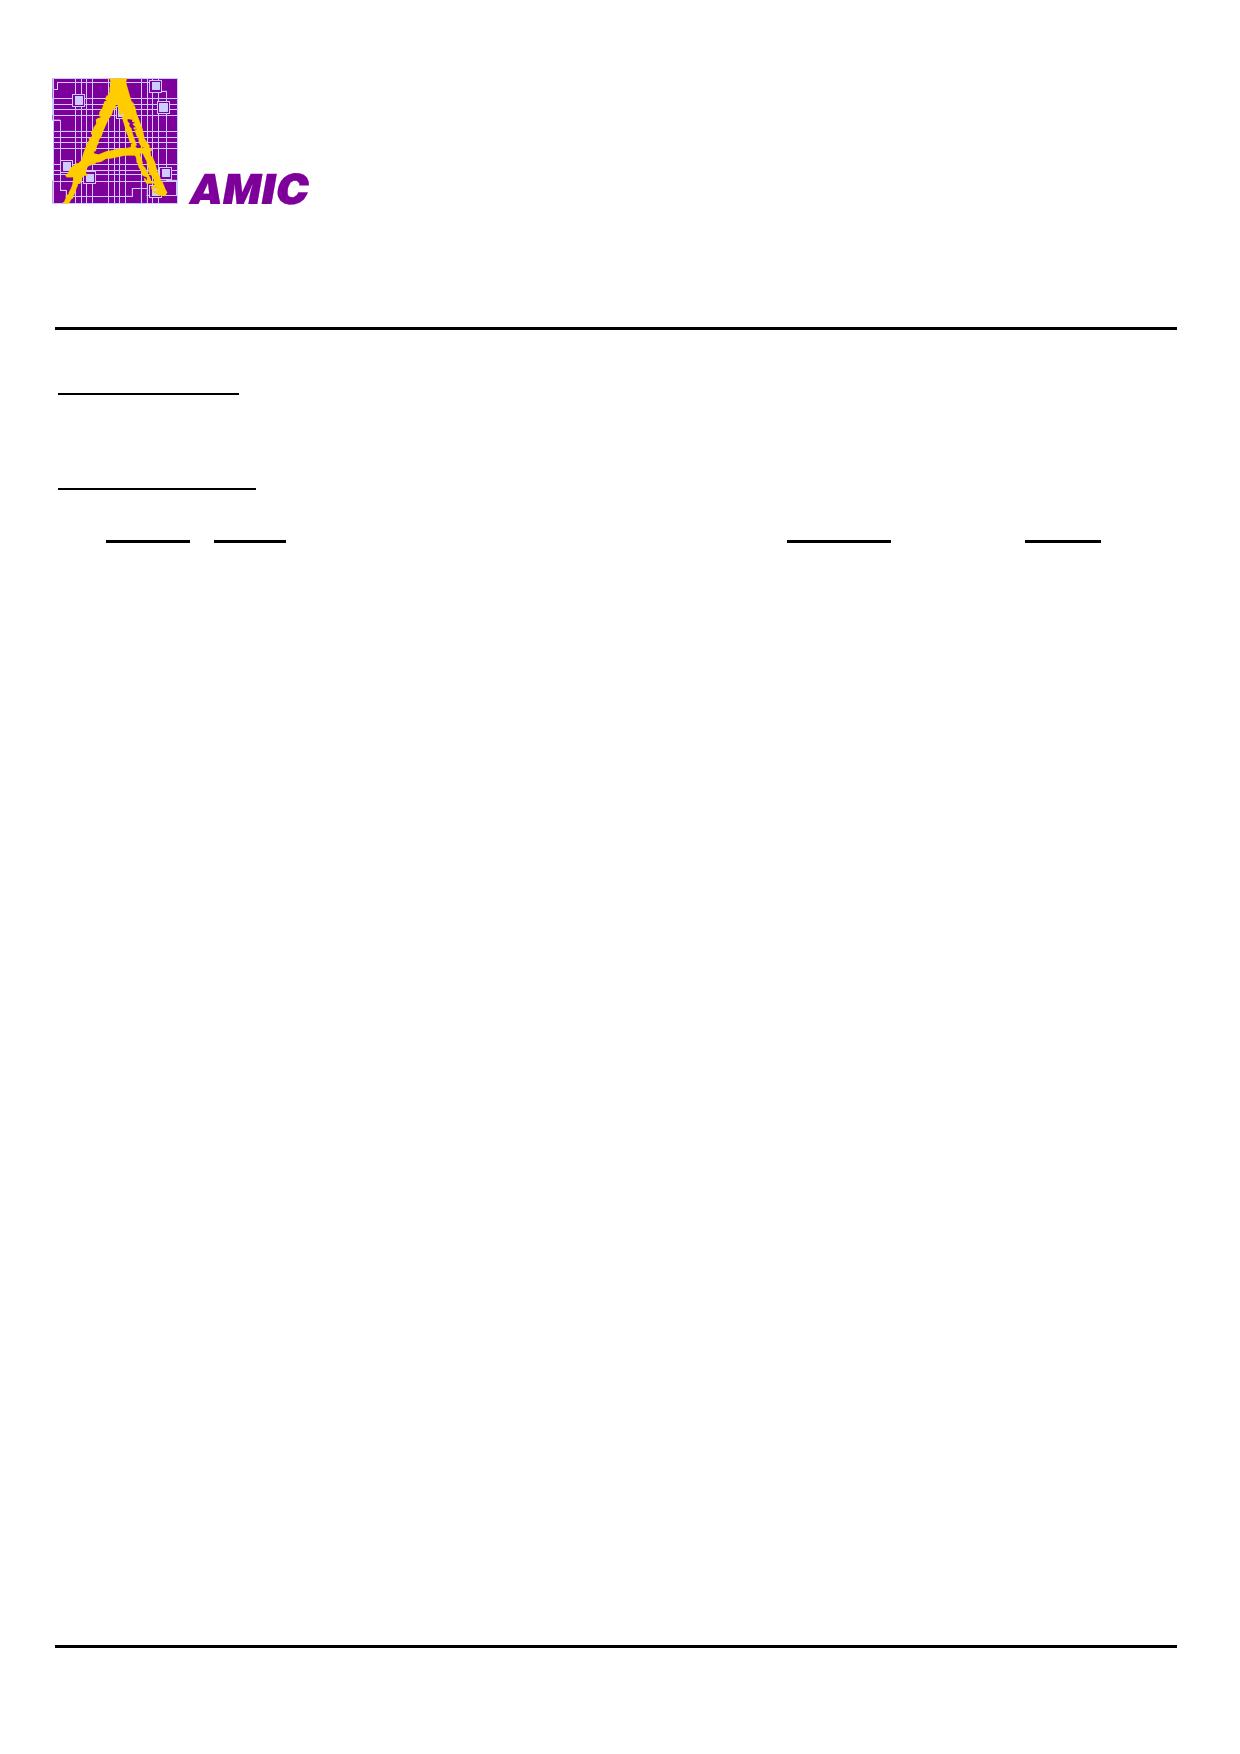 A25L05P datasheet, circuit